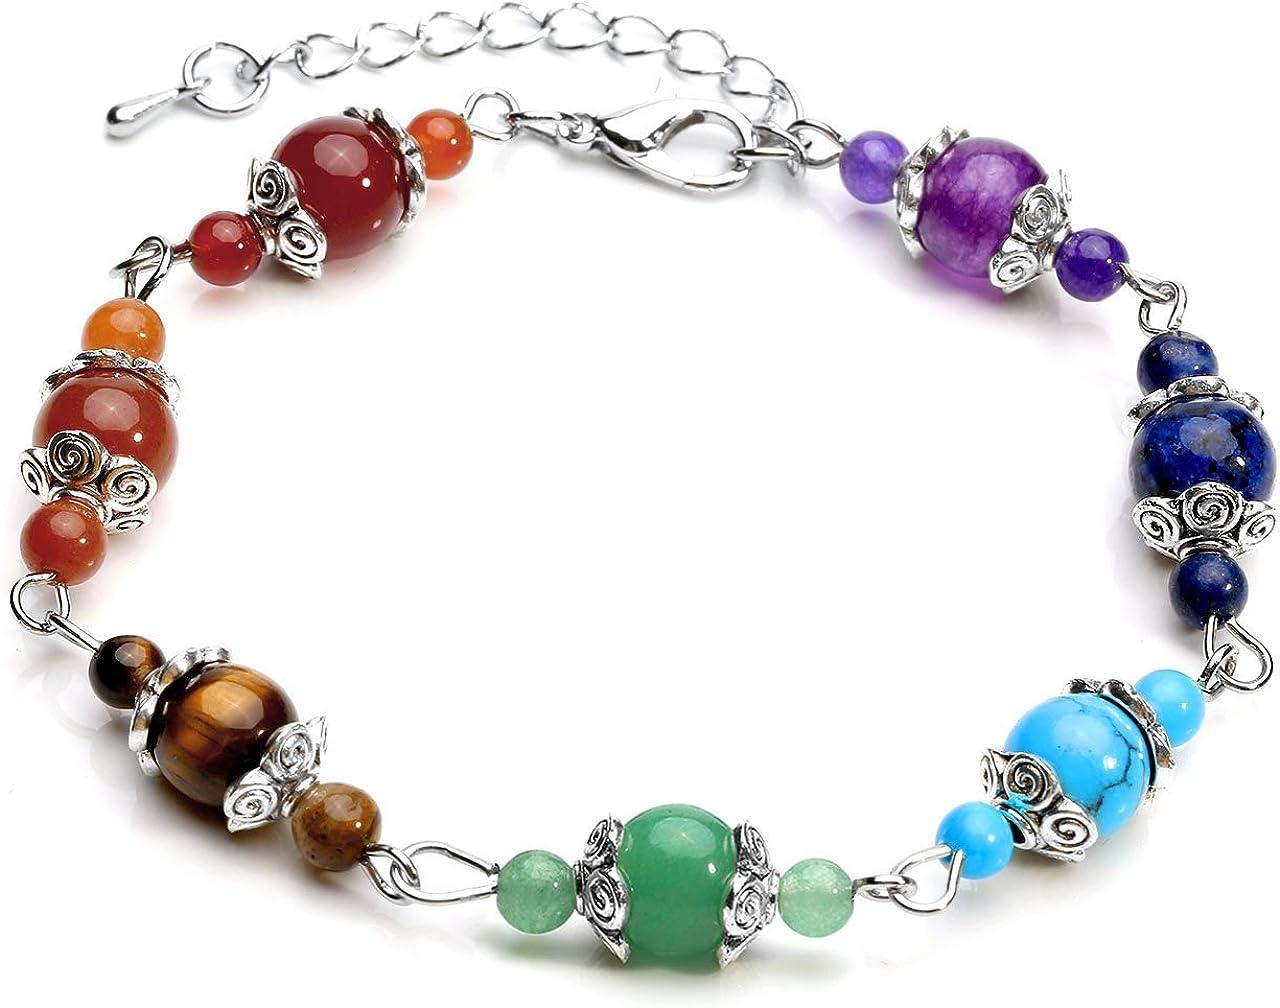 qgem piedras preciosas joyas 7Chakra pulsera Energía Terapia Yoga Balance Pulsera de maduro para mujer ajustable